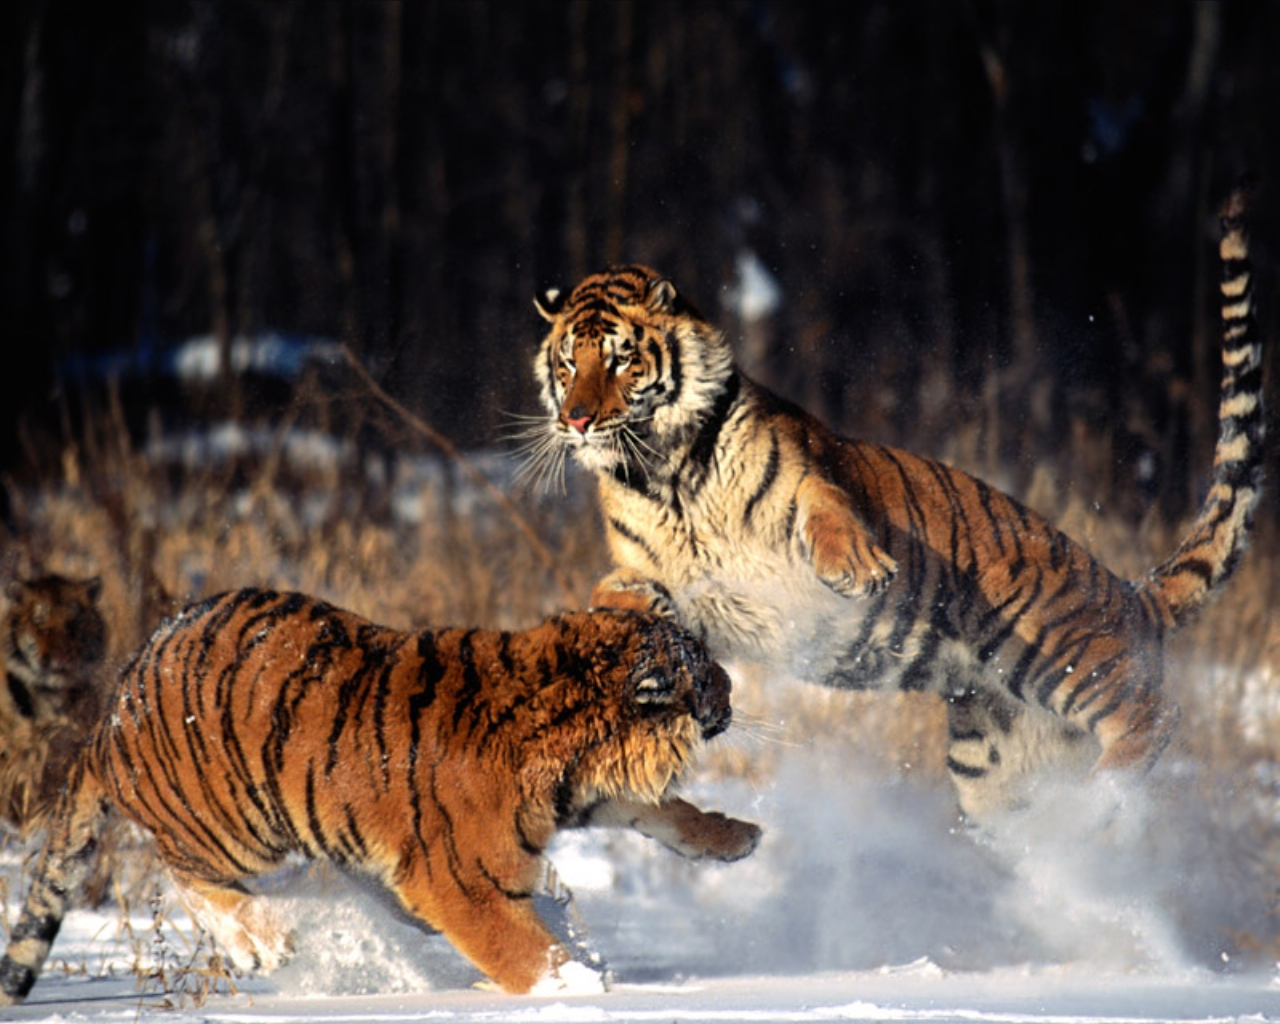 http://2.bp.blogspot.com/-gQmrwO1klAI/UFXw7wsSxQI/AAAAAAAAEPE/742mtvzZDHY/s1600/siberian-tigers-fighting.jpg